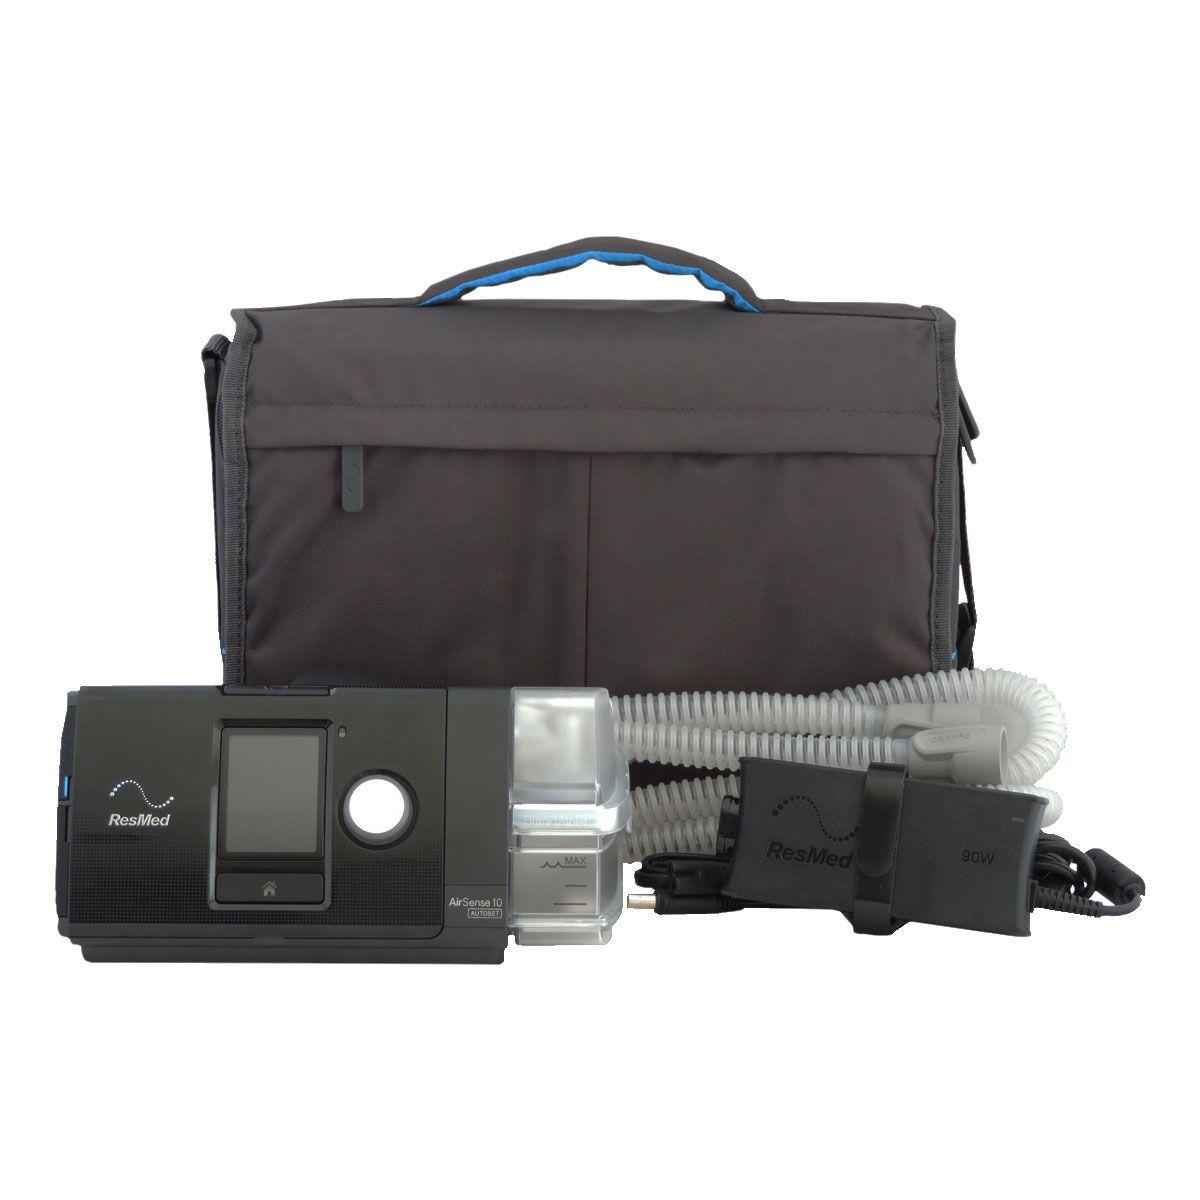 CPAP AIRSENSE 10 ELITE COM UMIDIFICADOR – RESMED É NA RESPIRECARE